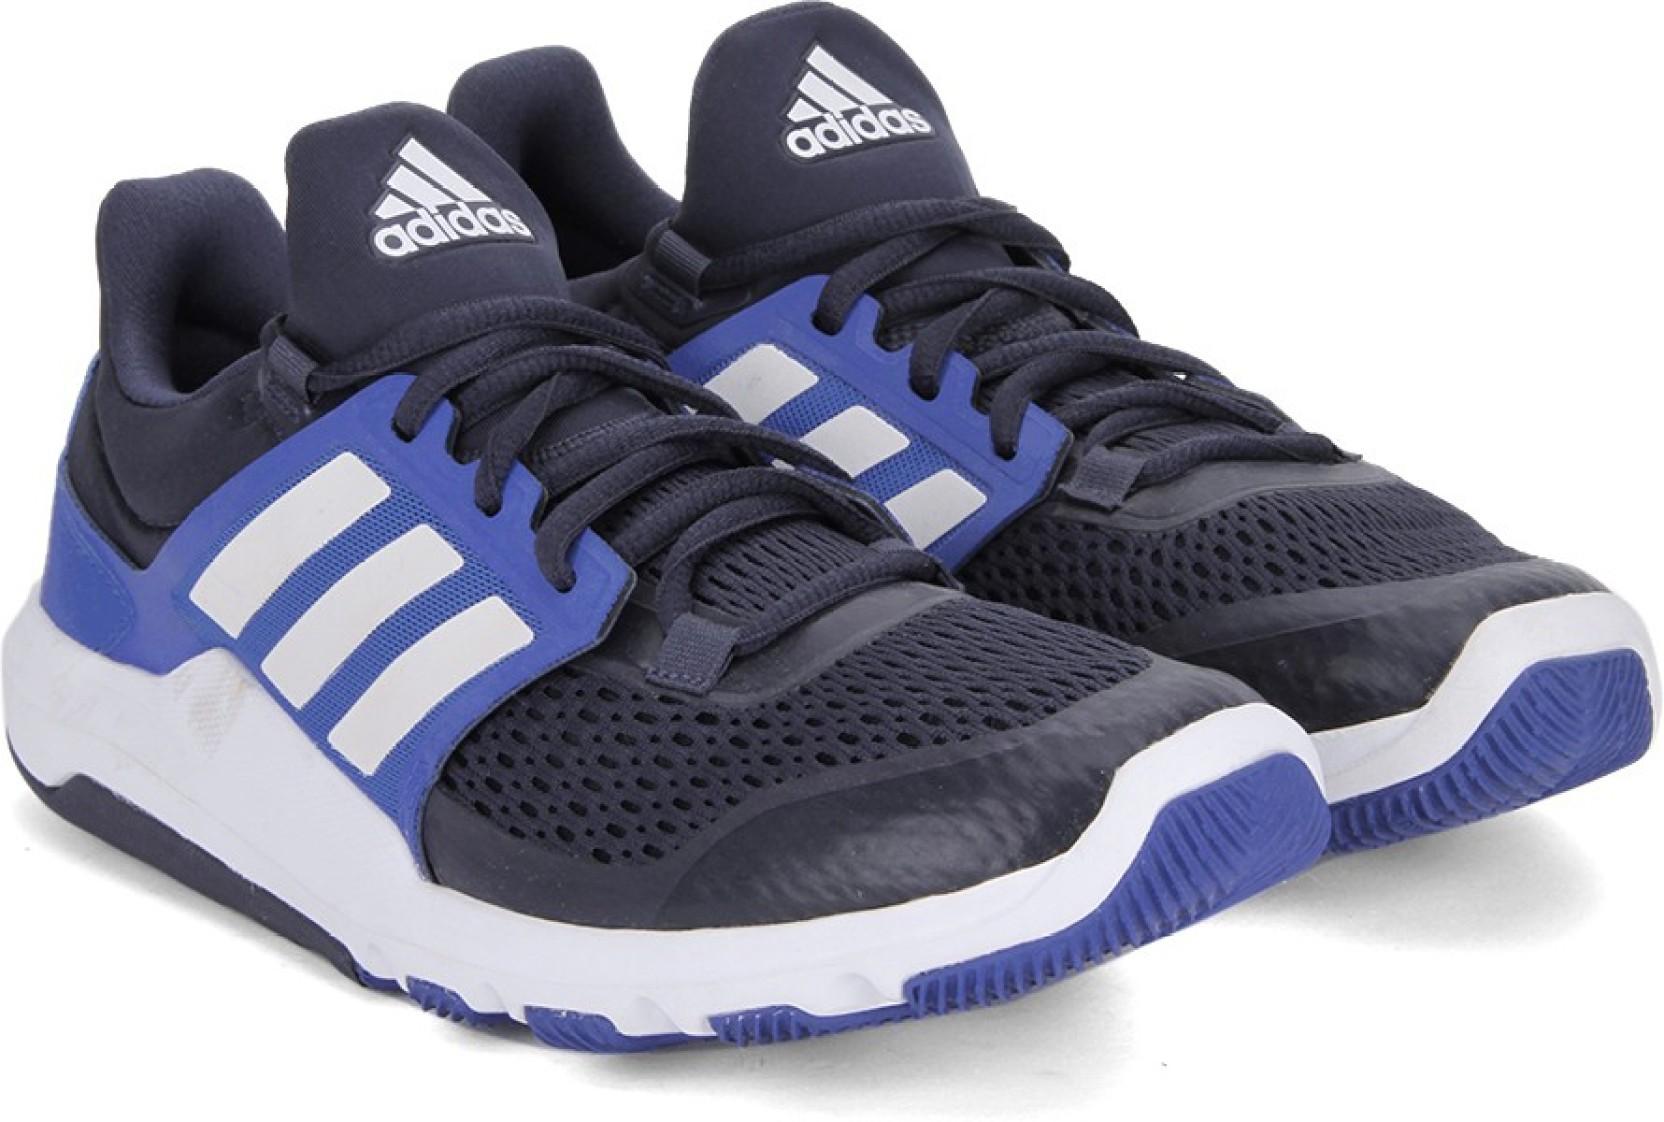 f405e91b2cb ADIDAS ADIPURE 360.3 M Training Shoes For Men. Home